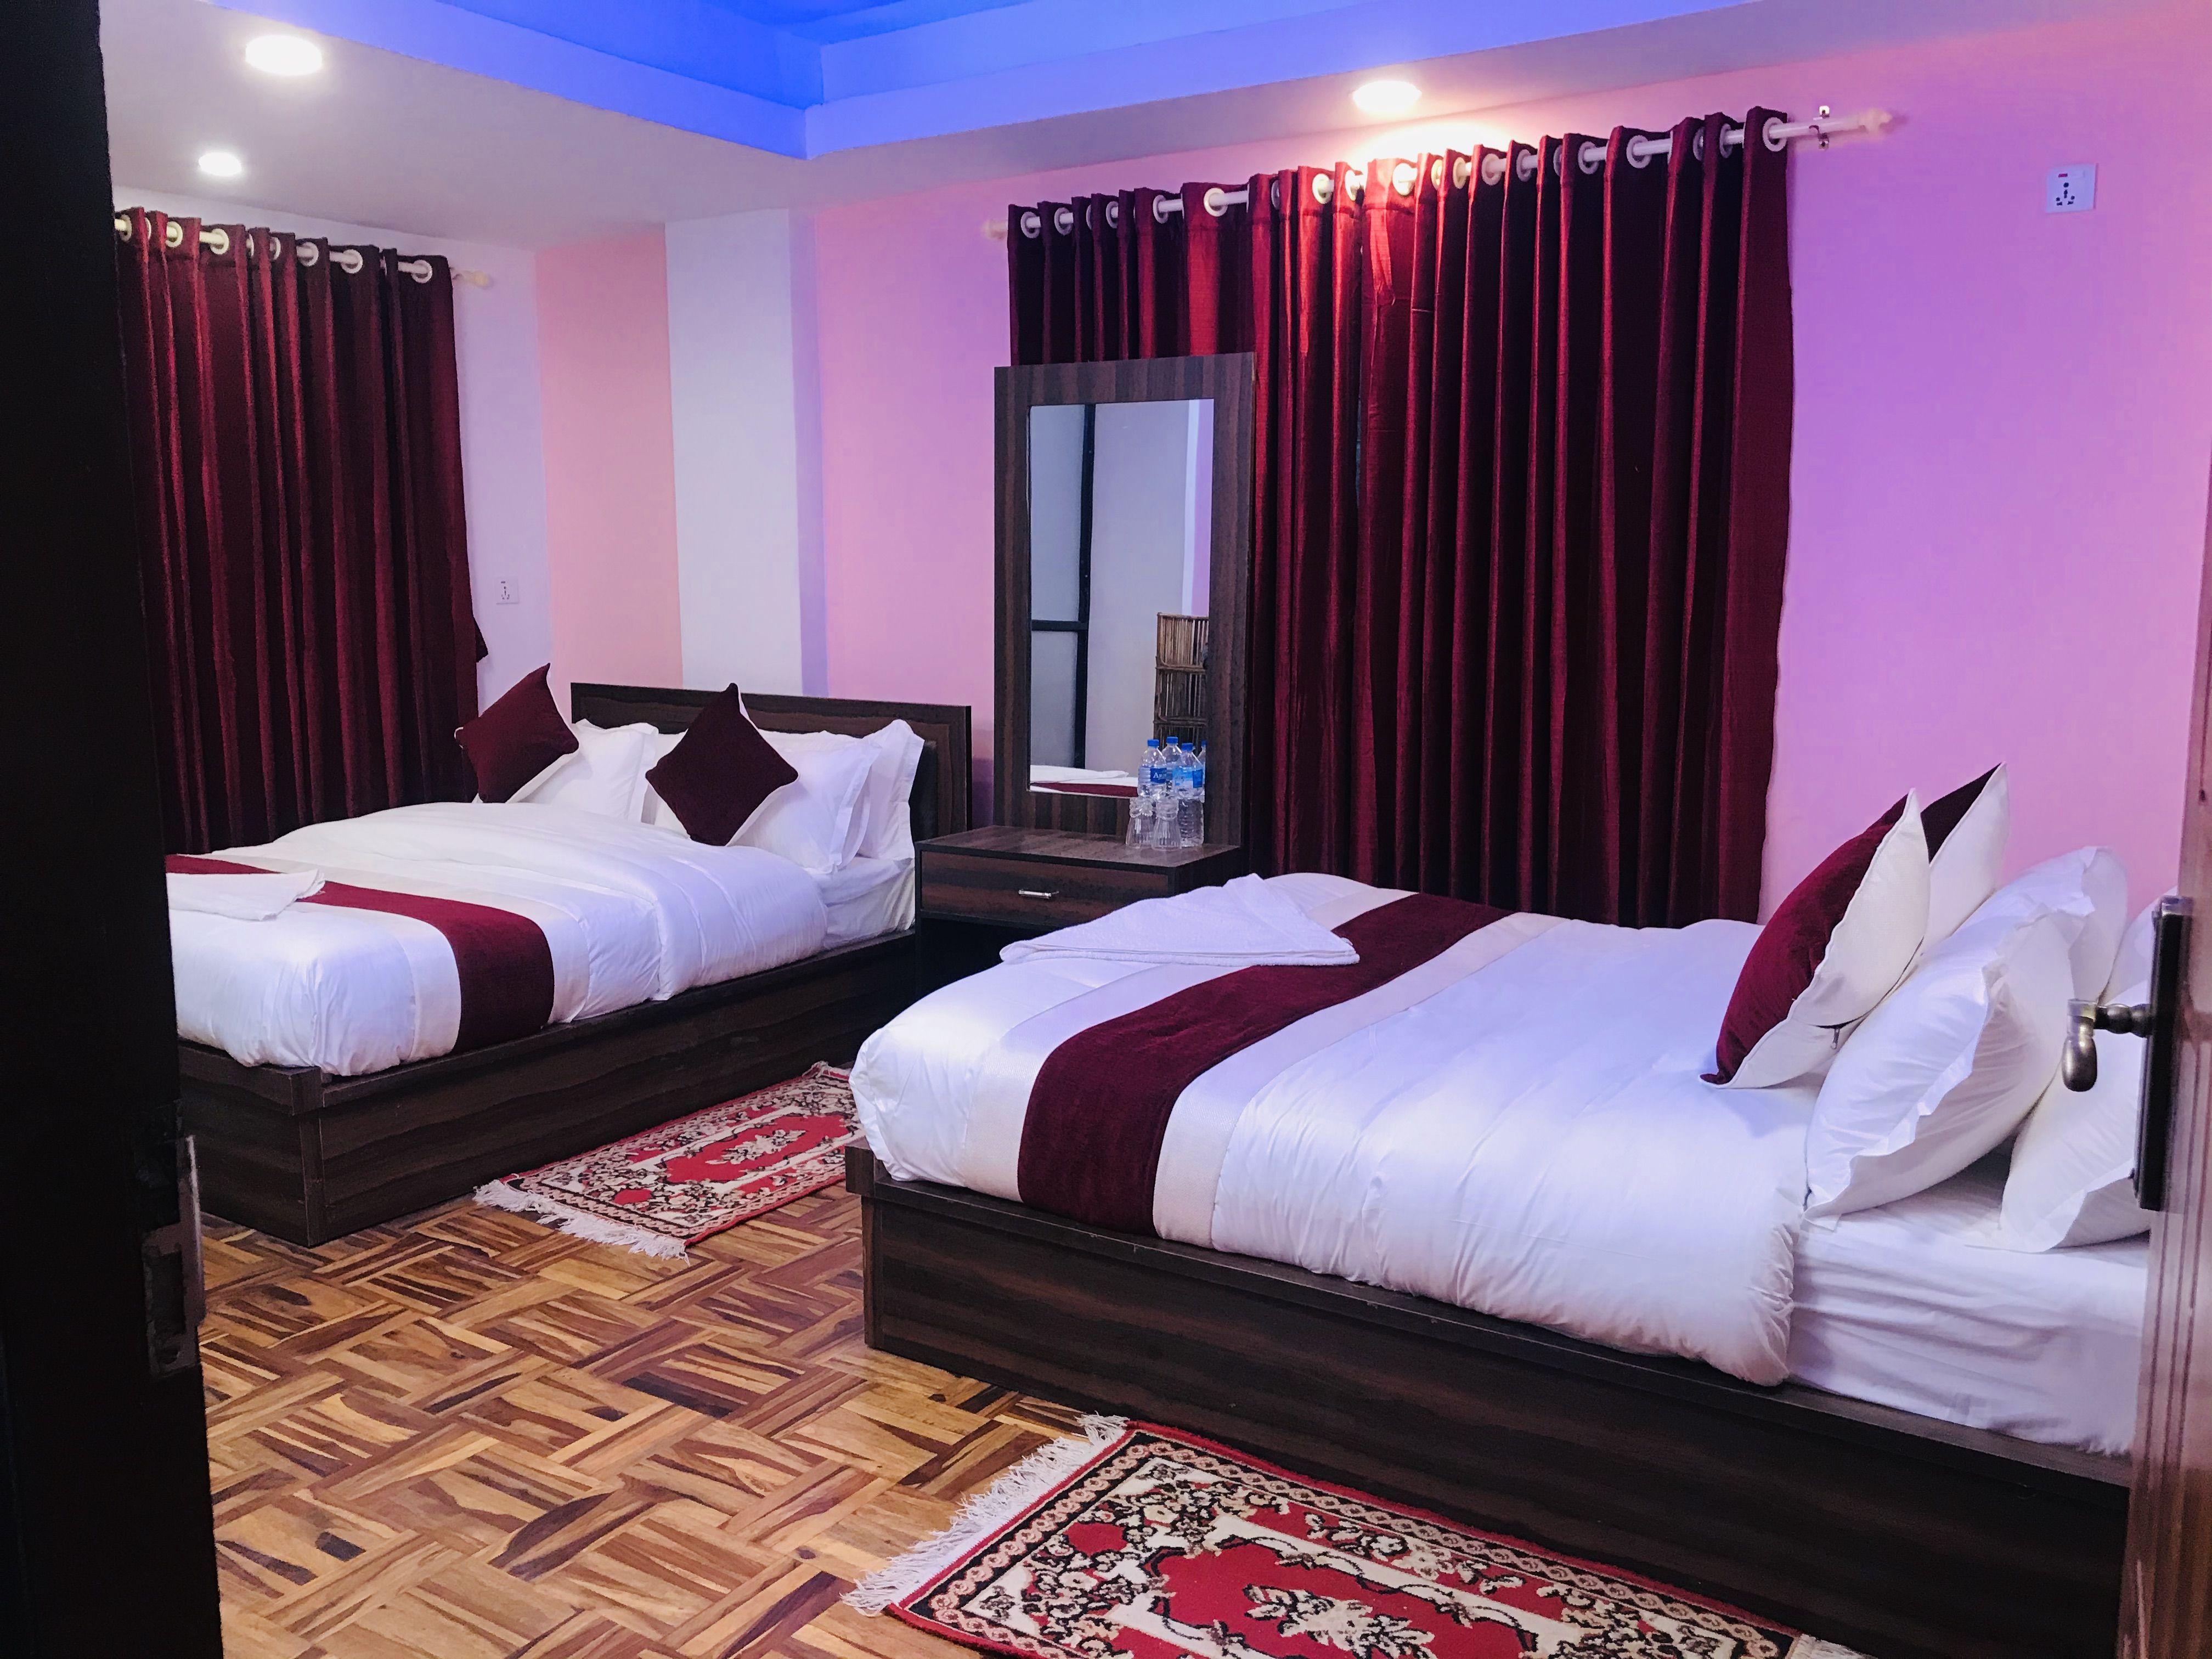 Homestay In Nepal Big Beds Twin Bedroom Bed Comforters